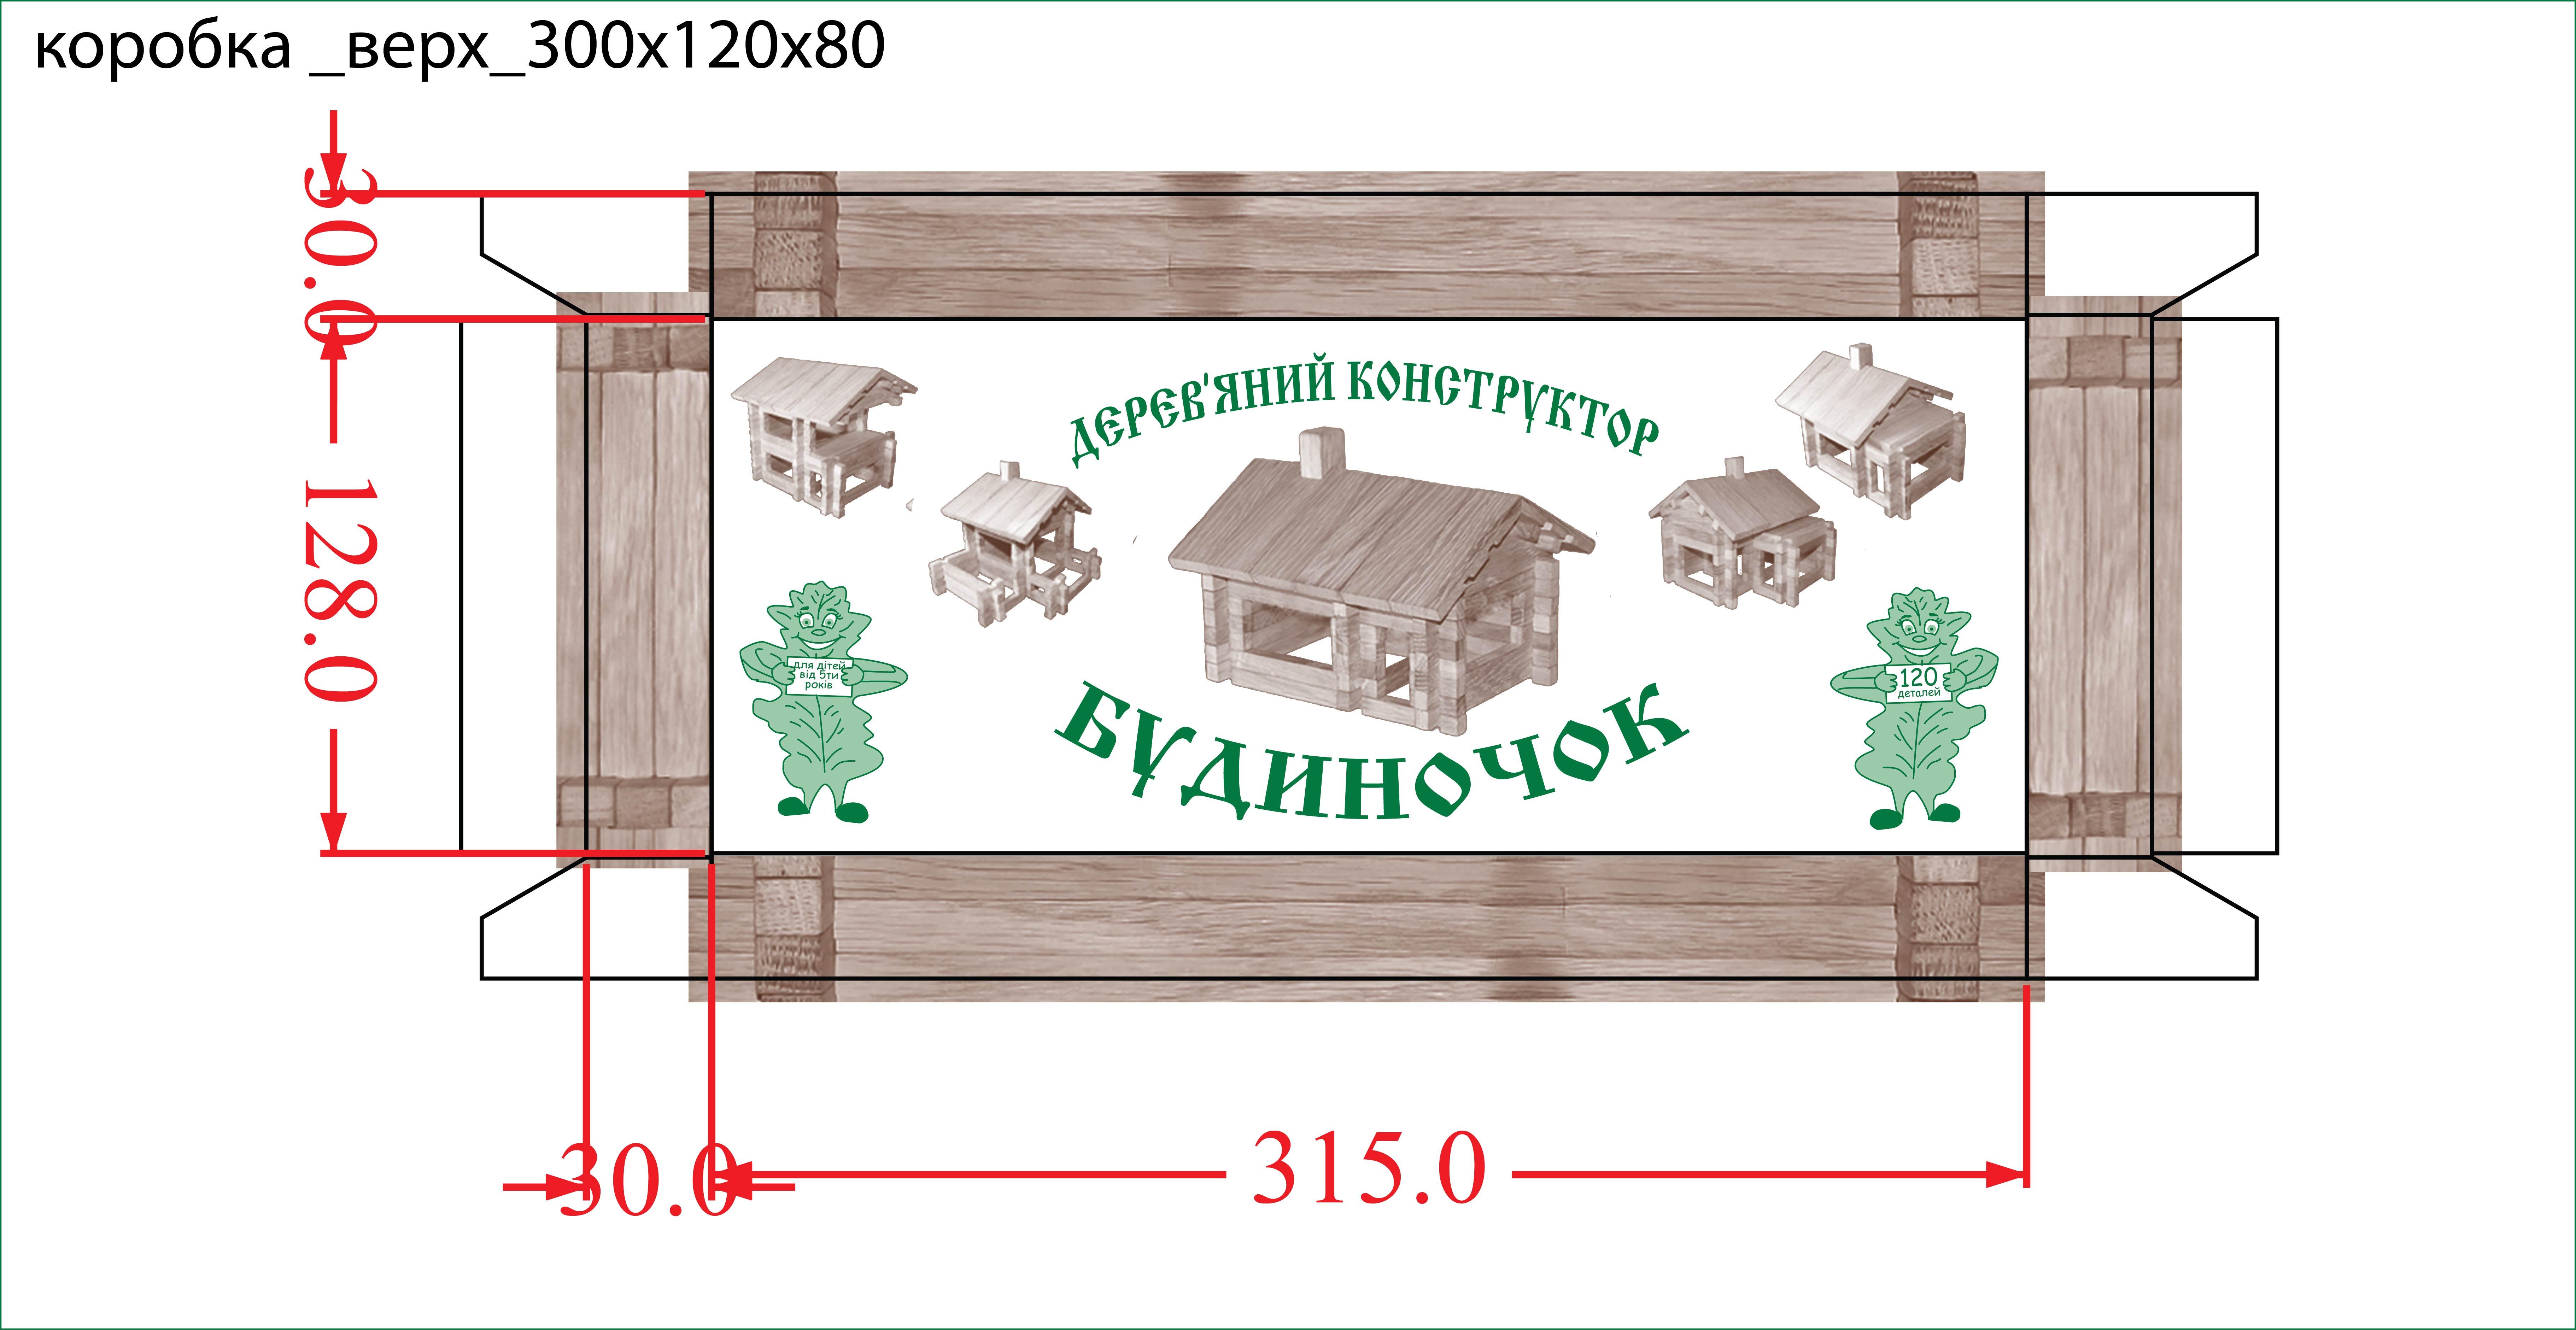 Фото Разработка дизайна и макета упаковки для конструктора